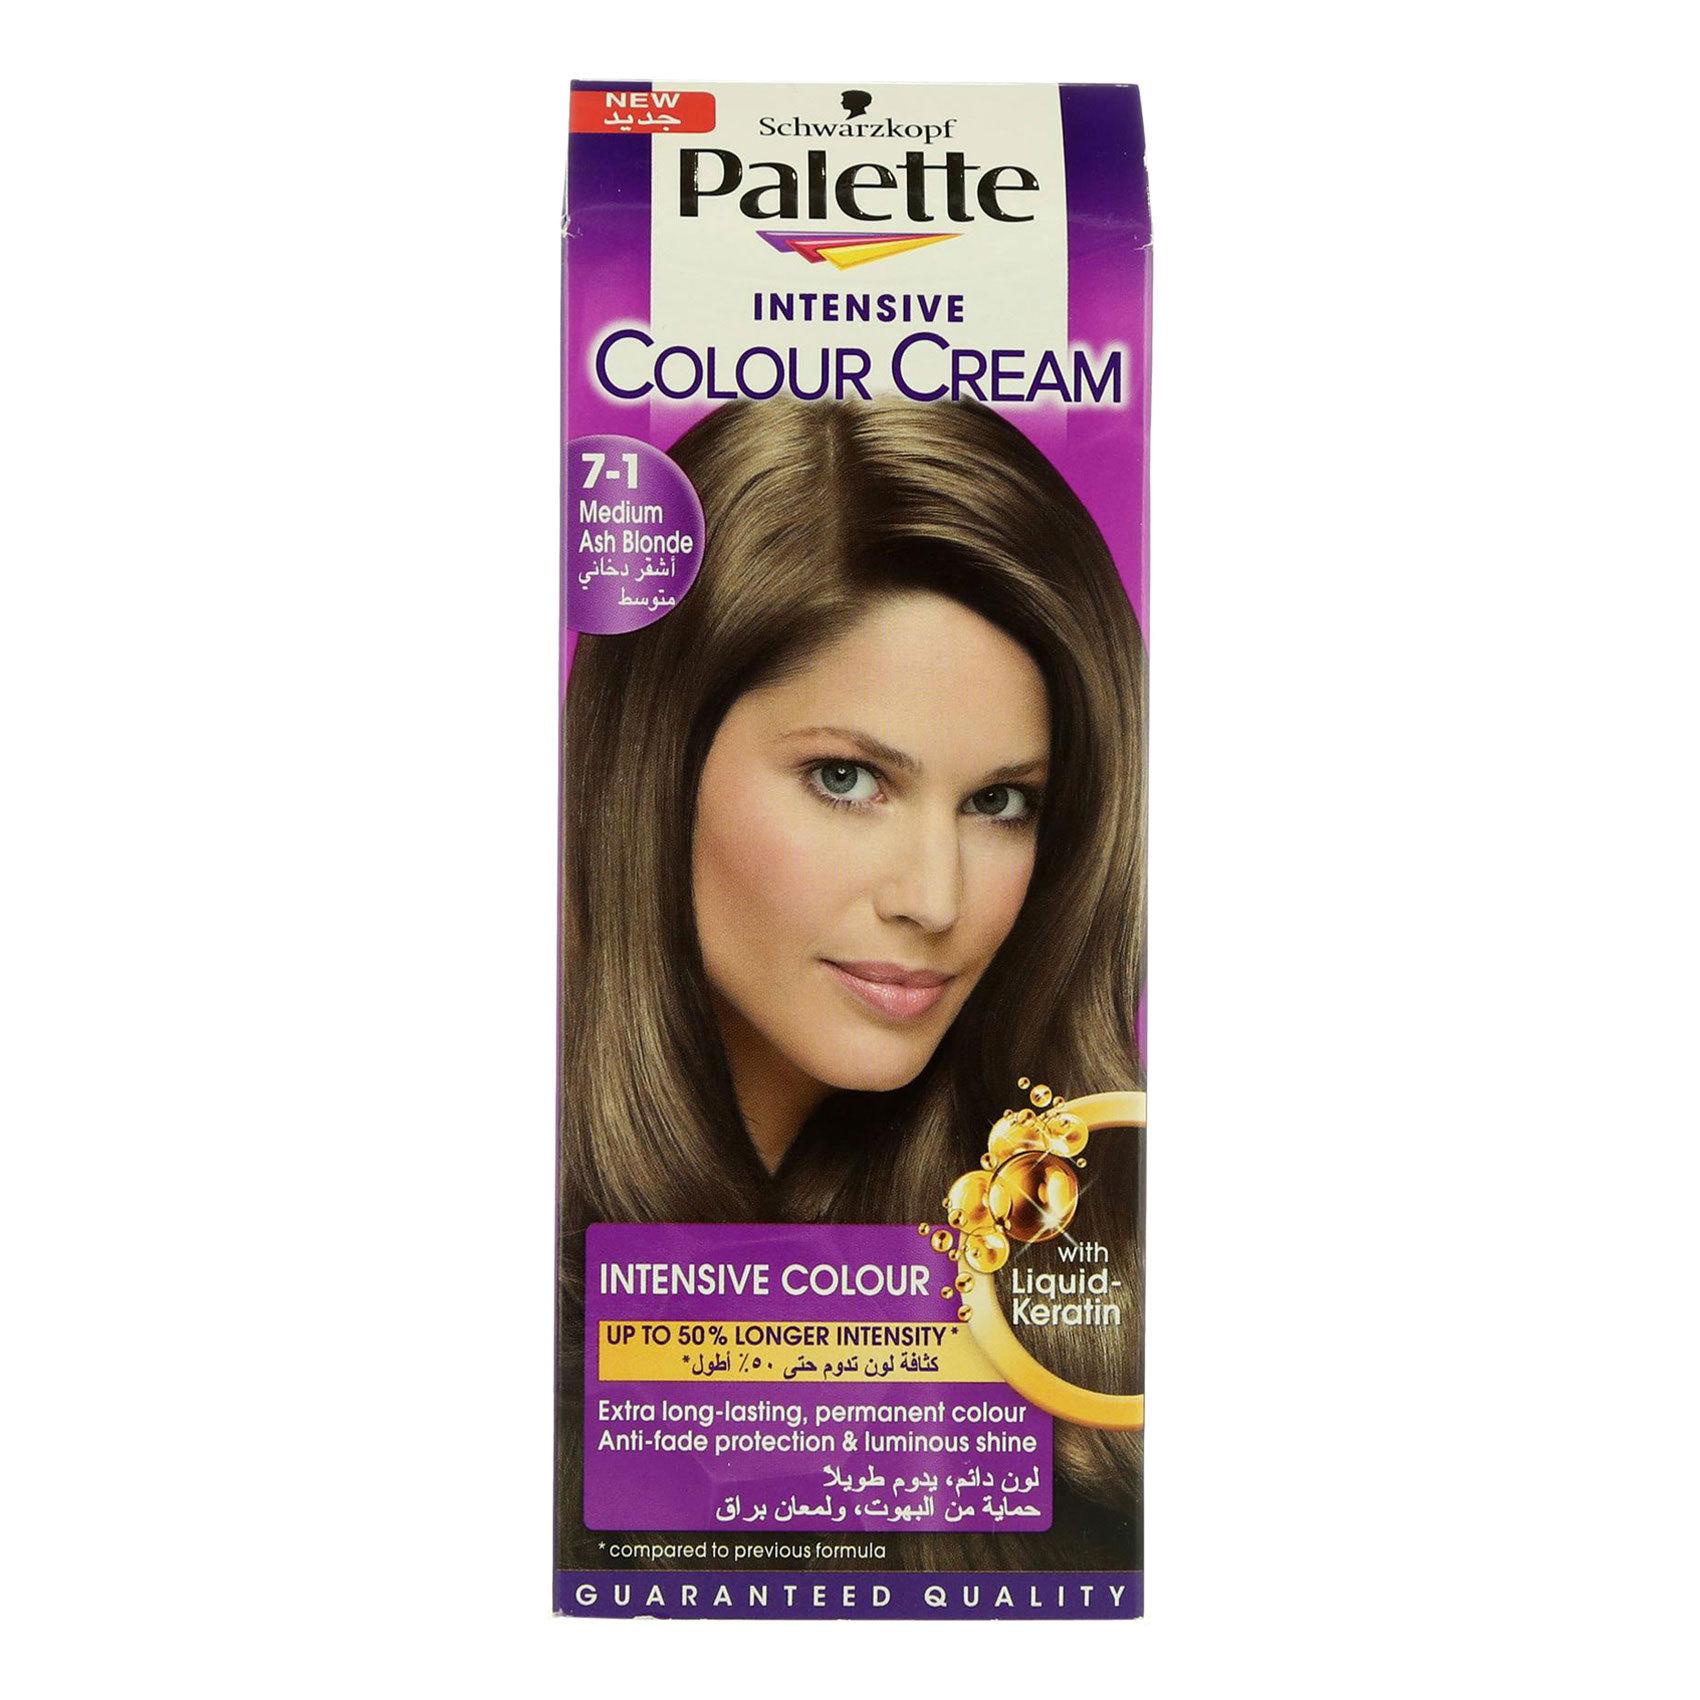 Buy Schwarzkopf Palette 7 1 Medium Ash Blonde Intensive Colour Cream